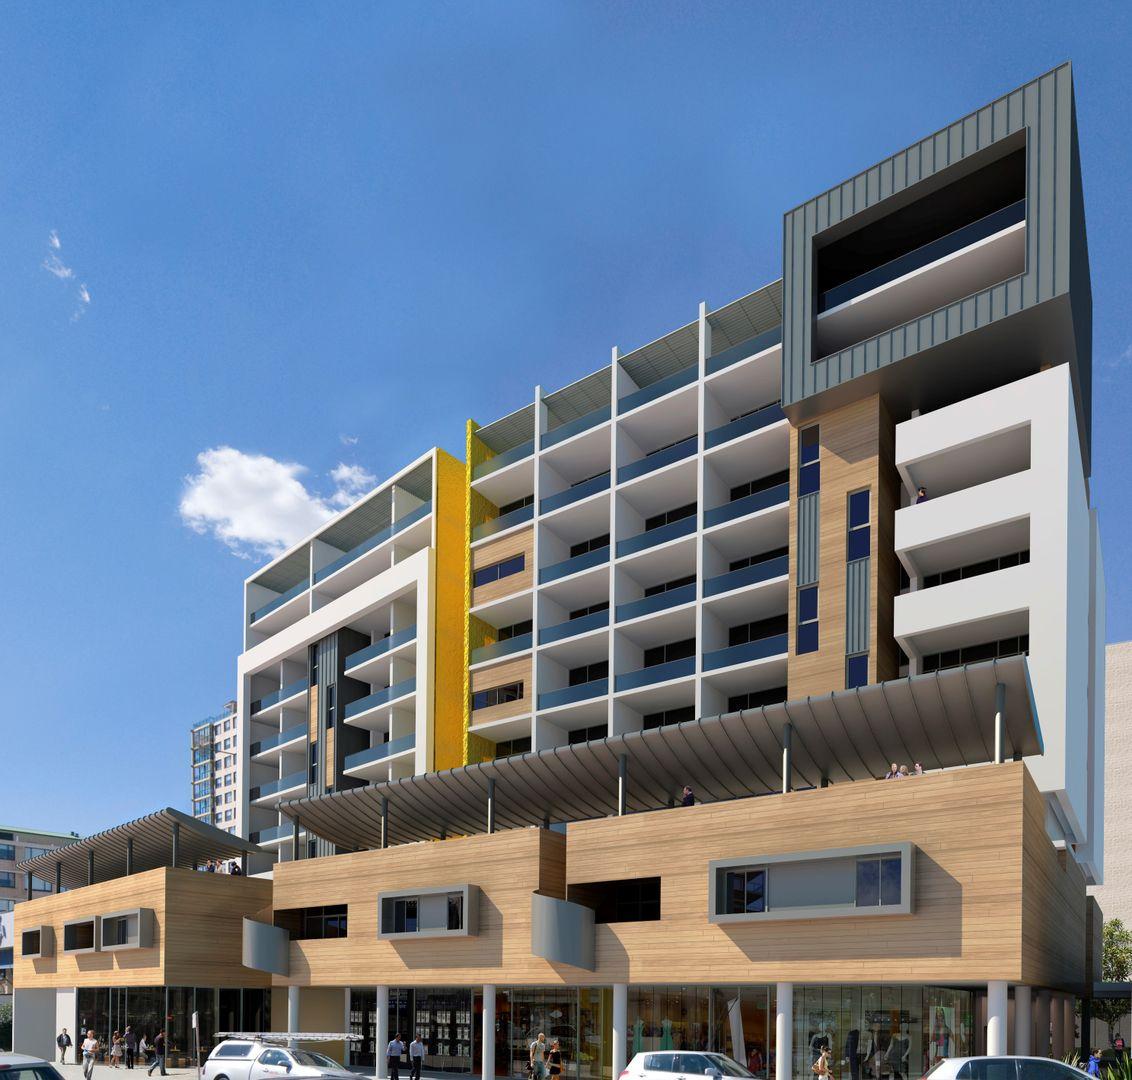 110/11-17 Woodville St, Hurstville NSW 2220, Image 0